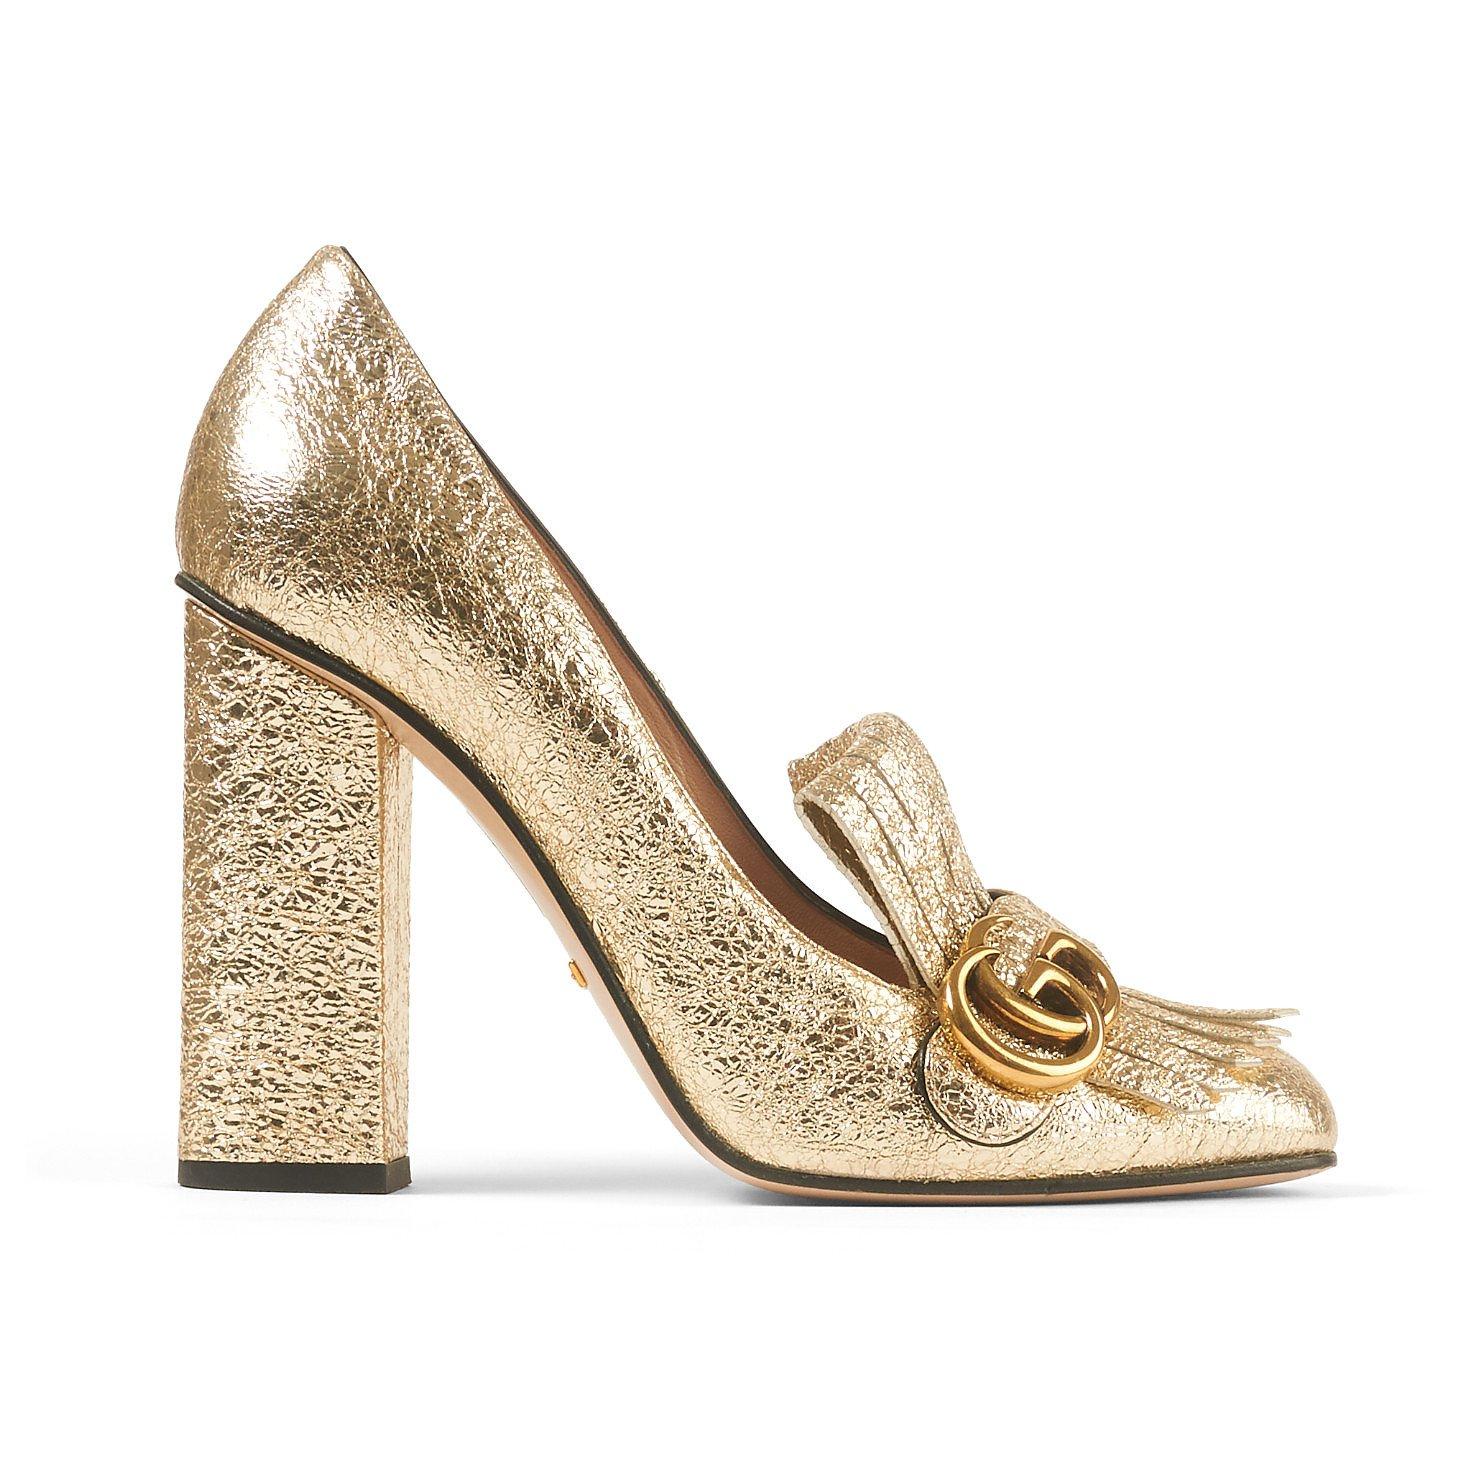 Rent or Buy Gucci Gold Platform Heels